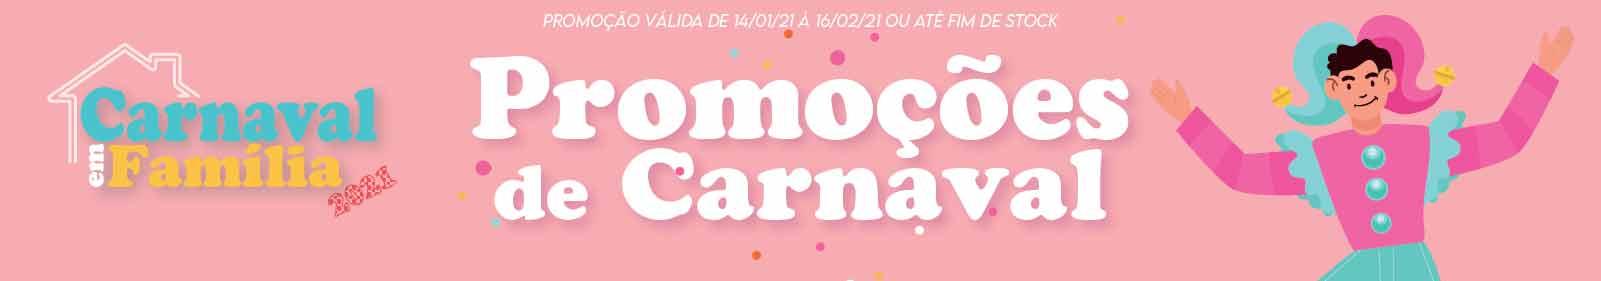 Promoções de Carnaval